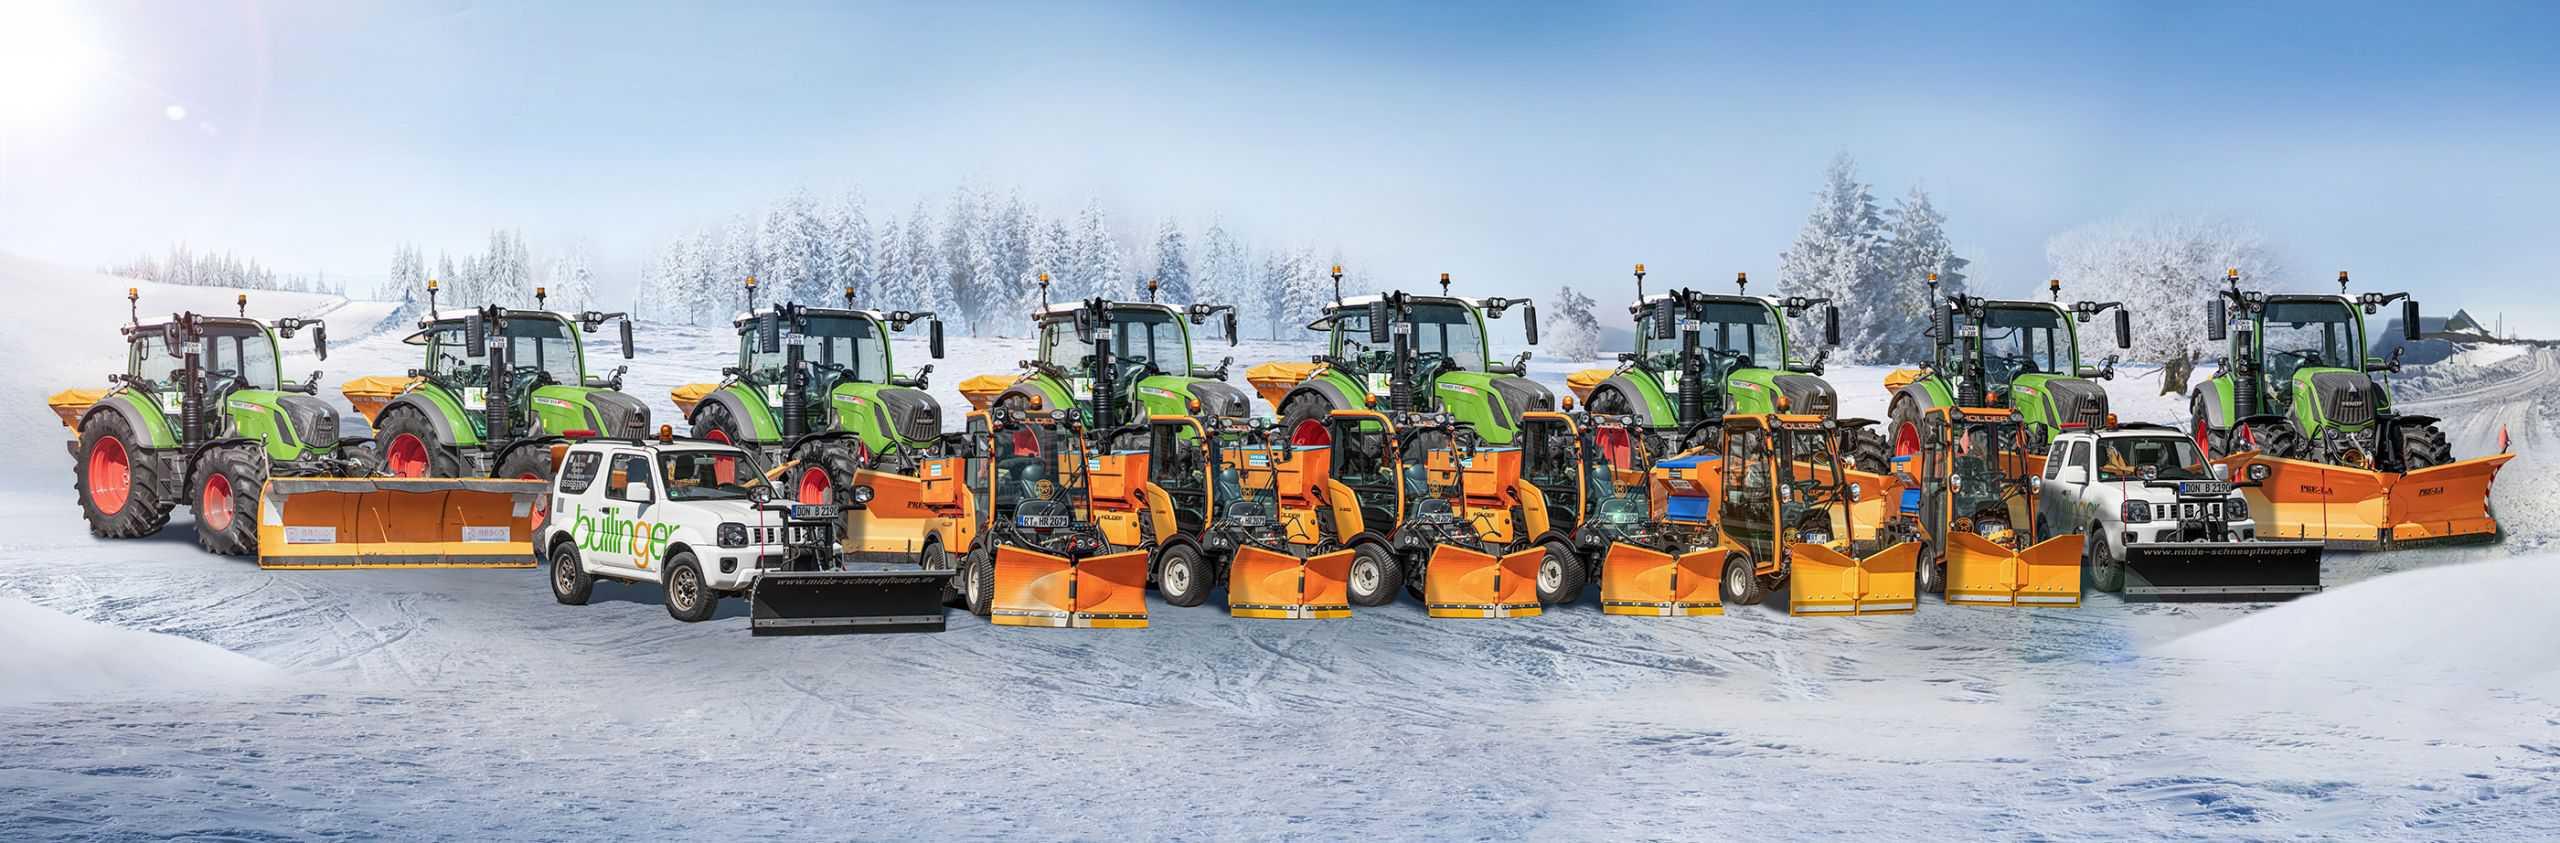 winterdienst-donauwoerth-augsburg-bullinger-fahrzeuge